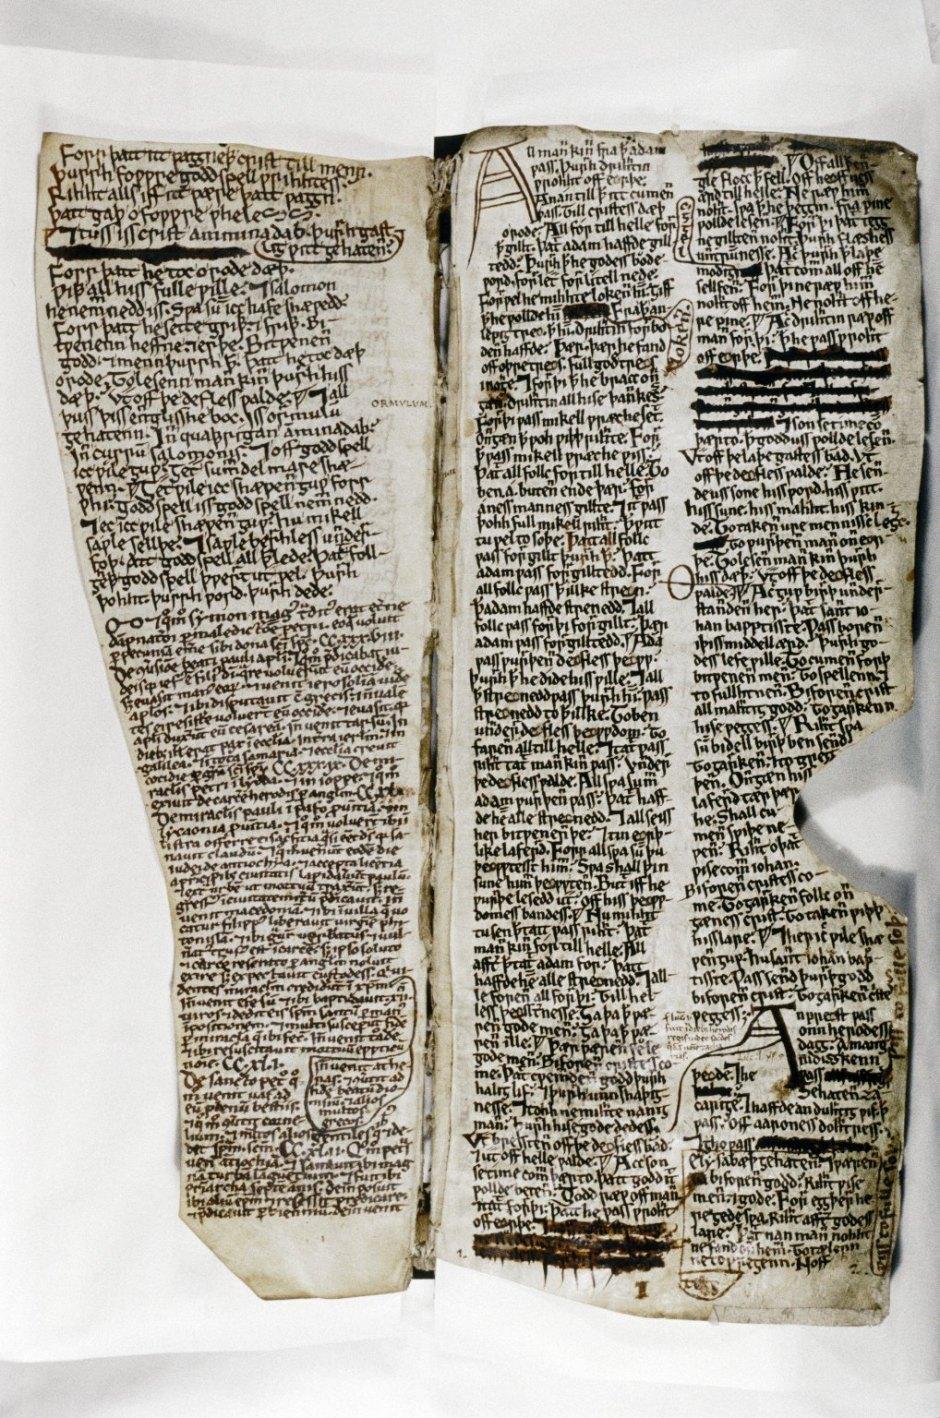 Digital Image of Folio 10r